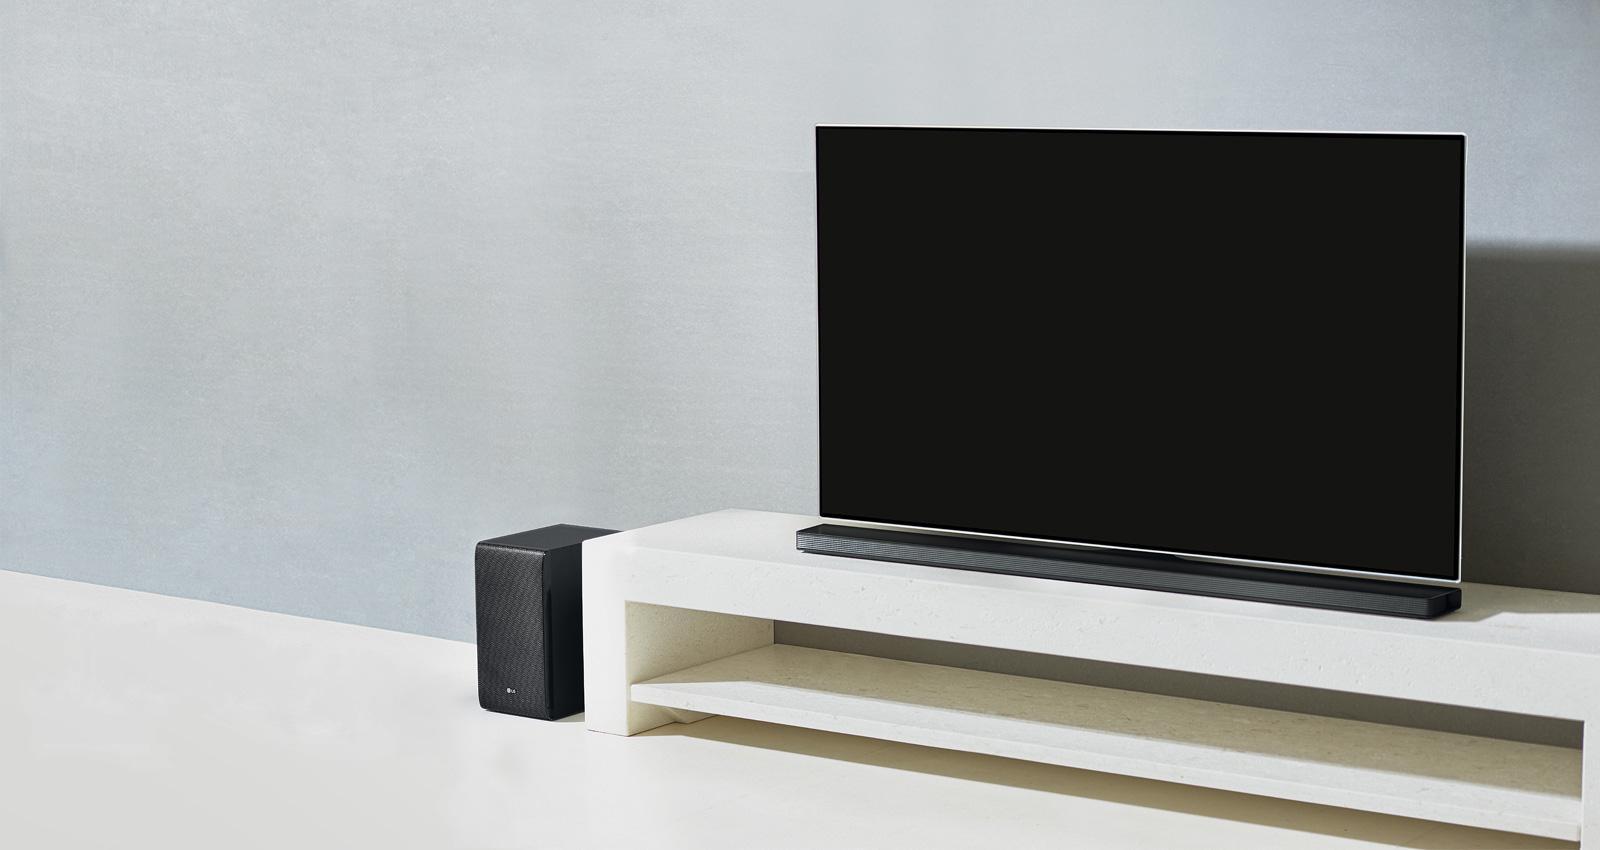 Lg Sj8 Save Up To 200 00 On The Lg Sj8 Today Lg Usa # Modeles De Table De Television